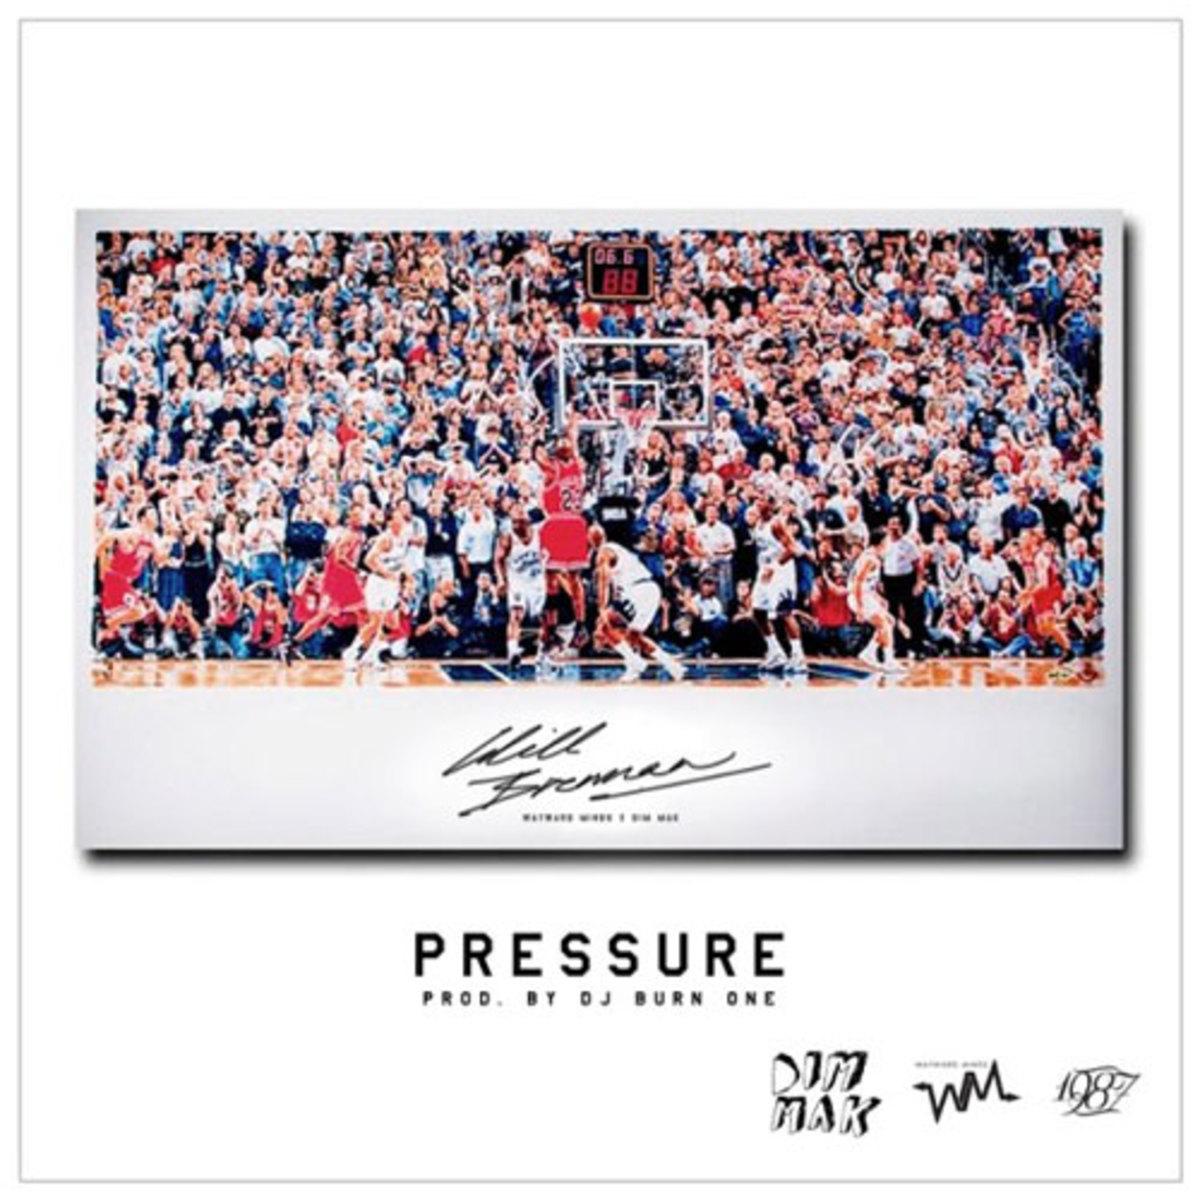 willbrennan-pressure.jpg